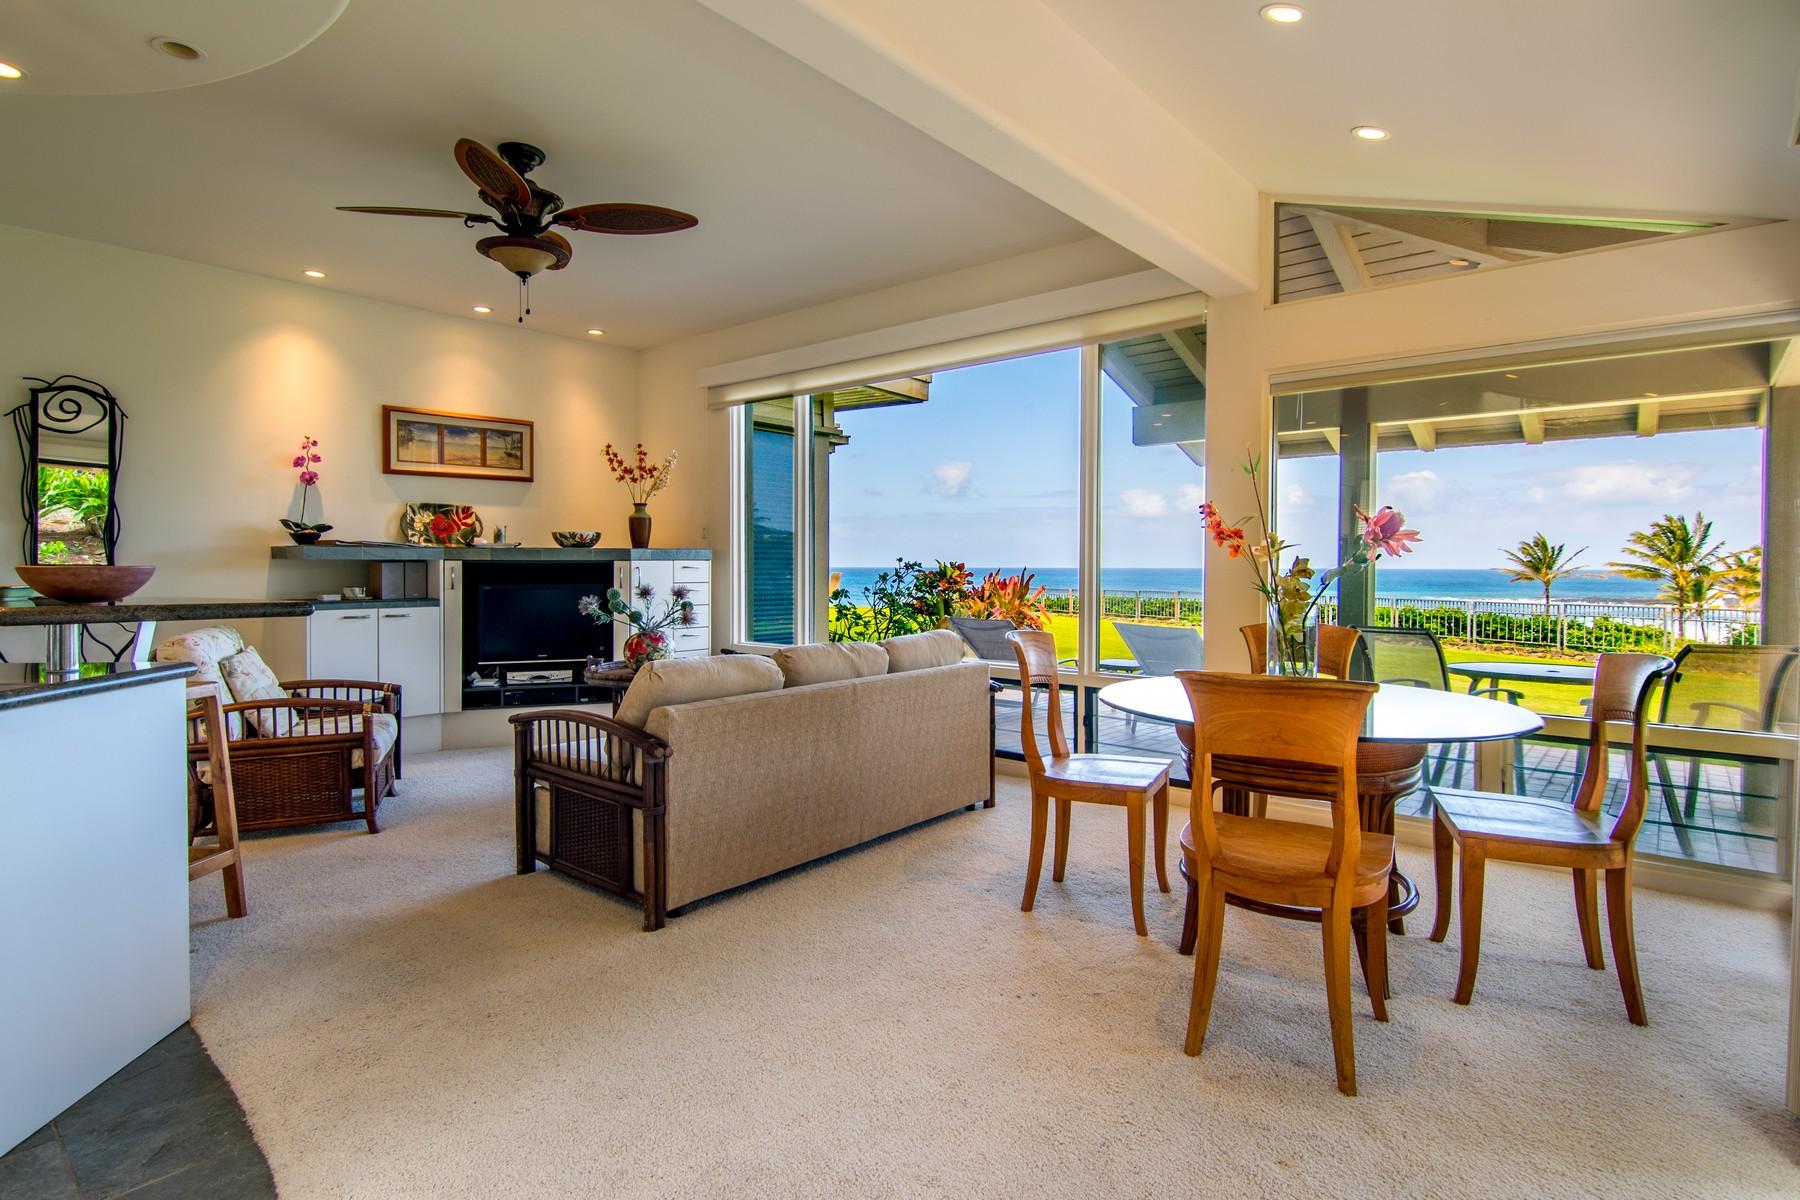 Condomínio para Venda às Kapalua Bay Villa 500 Bay Drive, Kapalua Bay Villa 19G5, Kapalua, Havaí, 96761 Estados Unidos